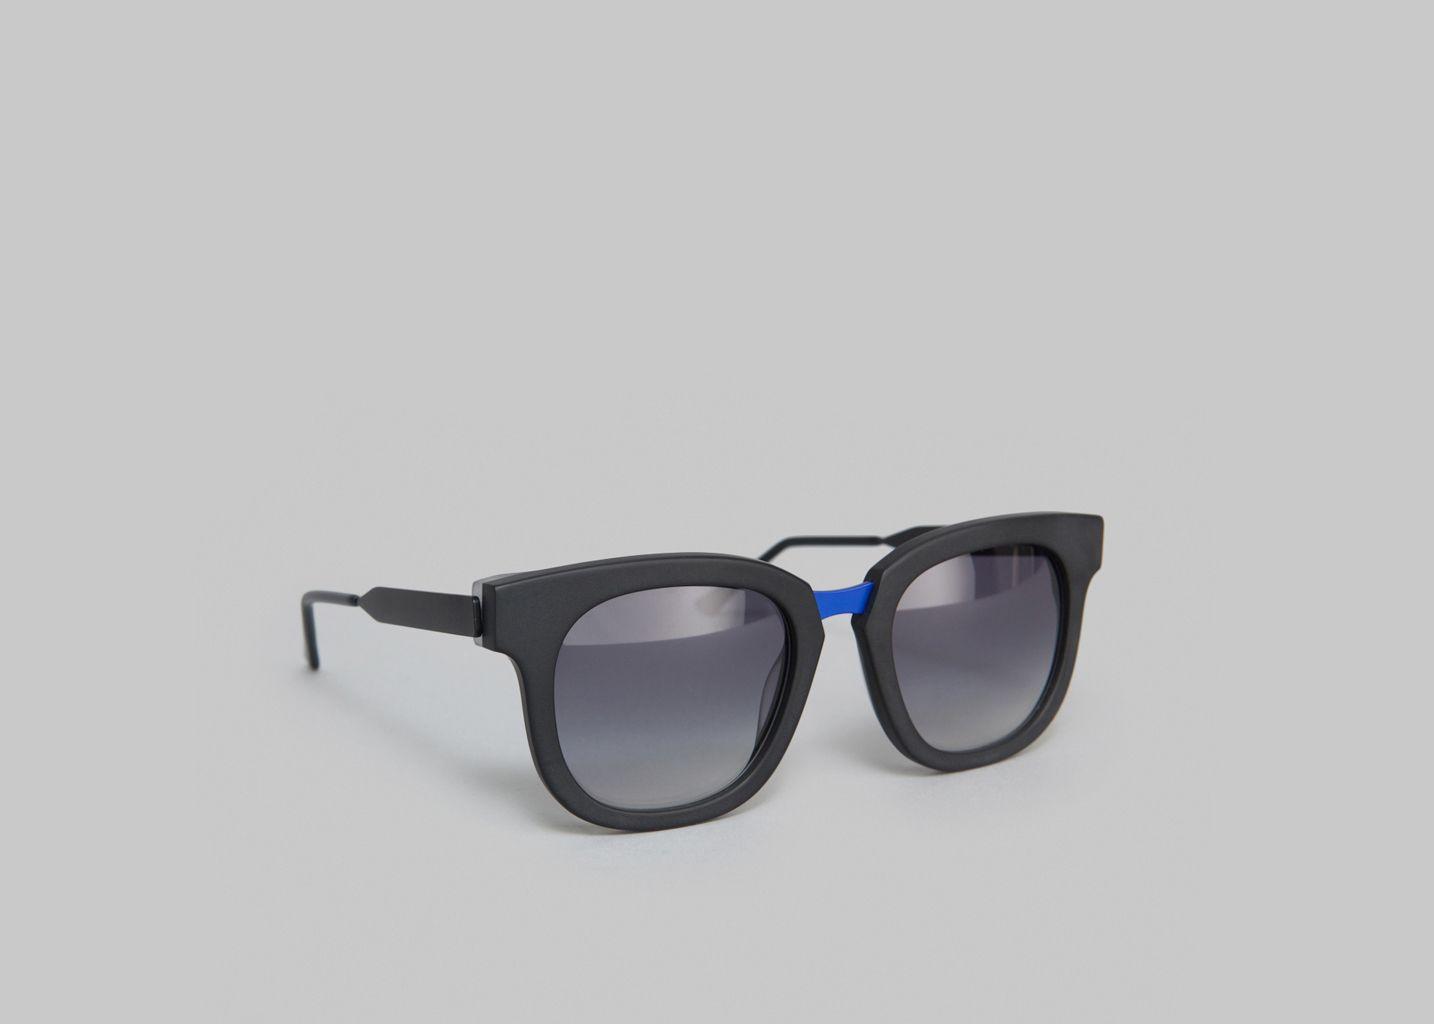 lunettes arbitrary thierry lasry noir l 39 exception. Black Bedroom Furniture Sets. Home Design Ideas